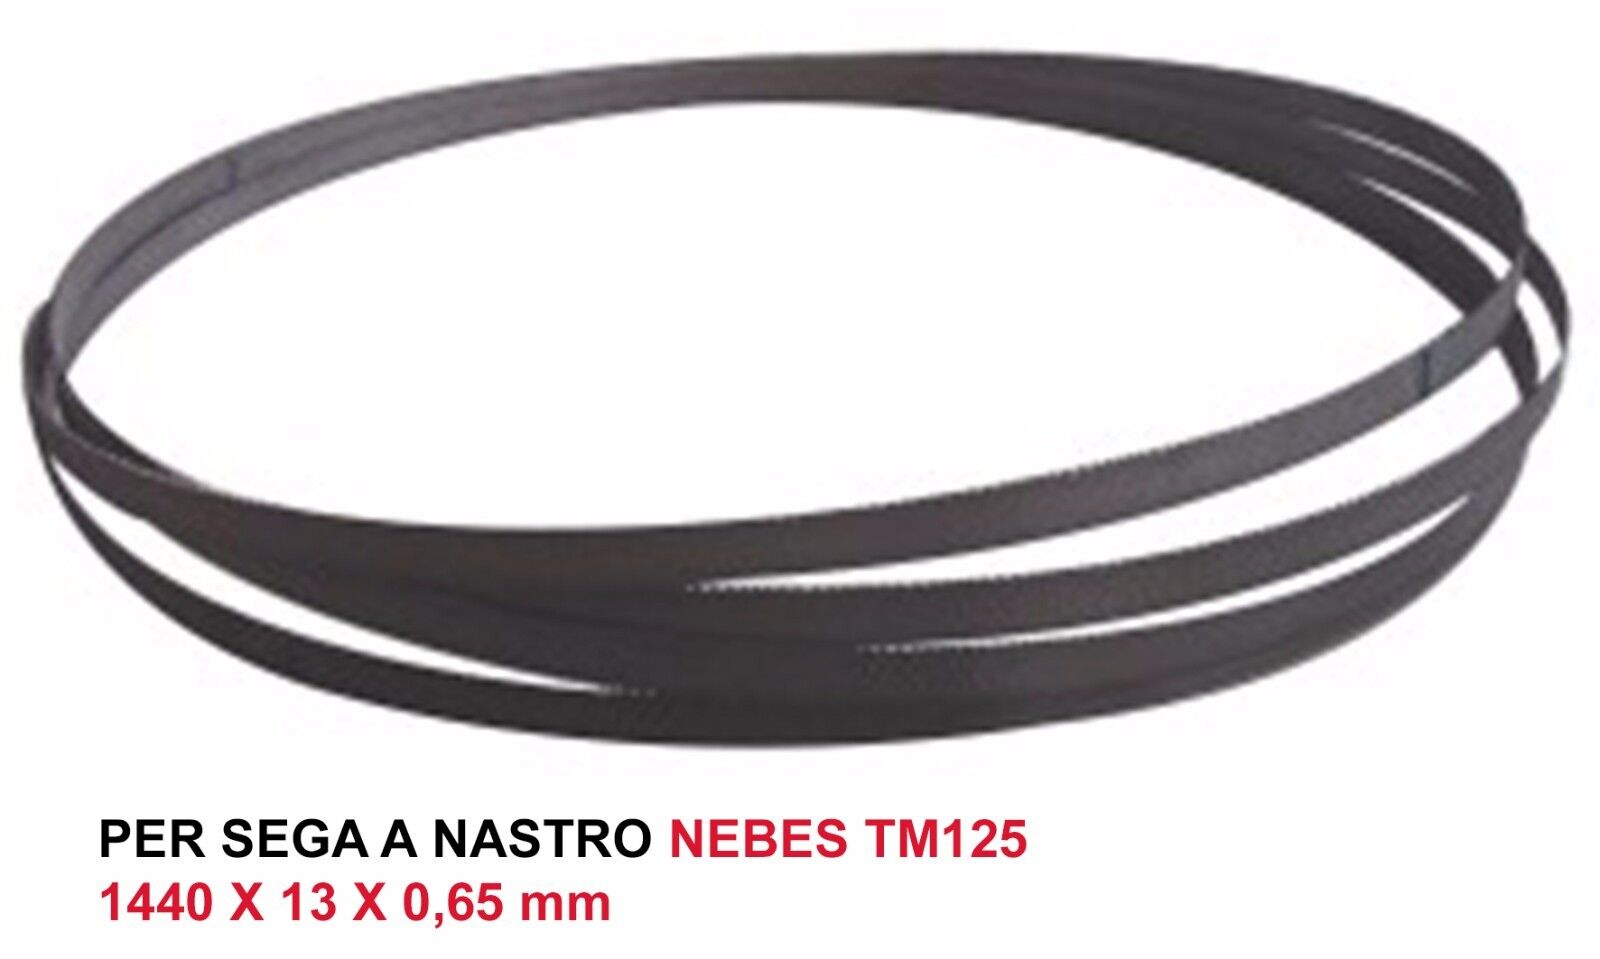 LAMA SEGA A NASTRO BIMETAL M42  RICAMBIO PER NEBES TM125  (1440 x 13 x 0,65 mm)